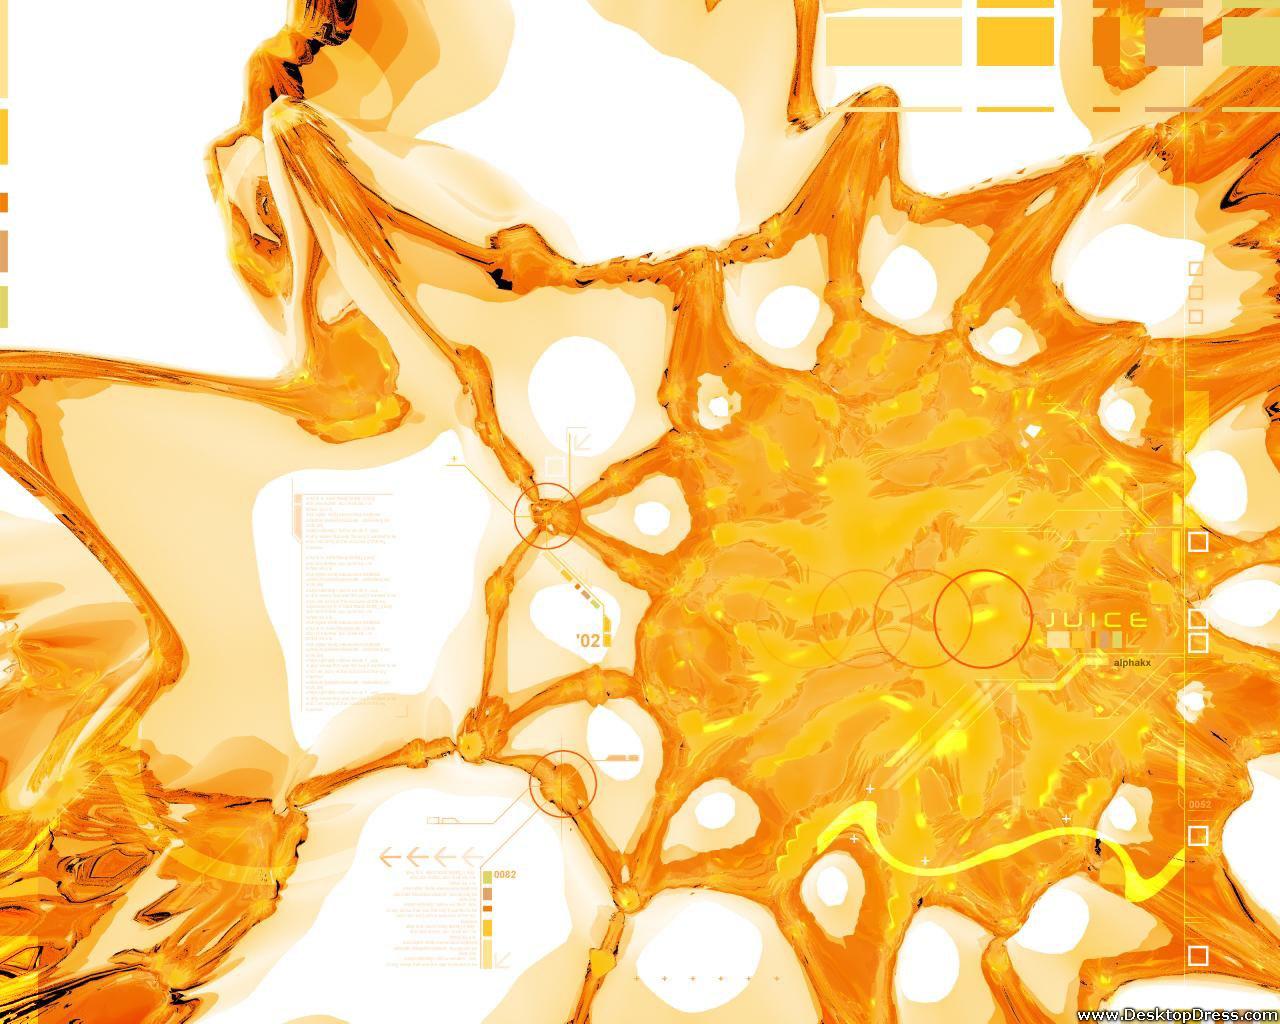 Desktop Wallpapers 3D Backgrounds Juice wwwdesktopdresscom 1280x1024